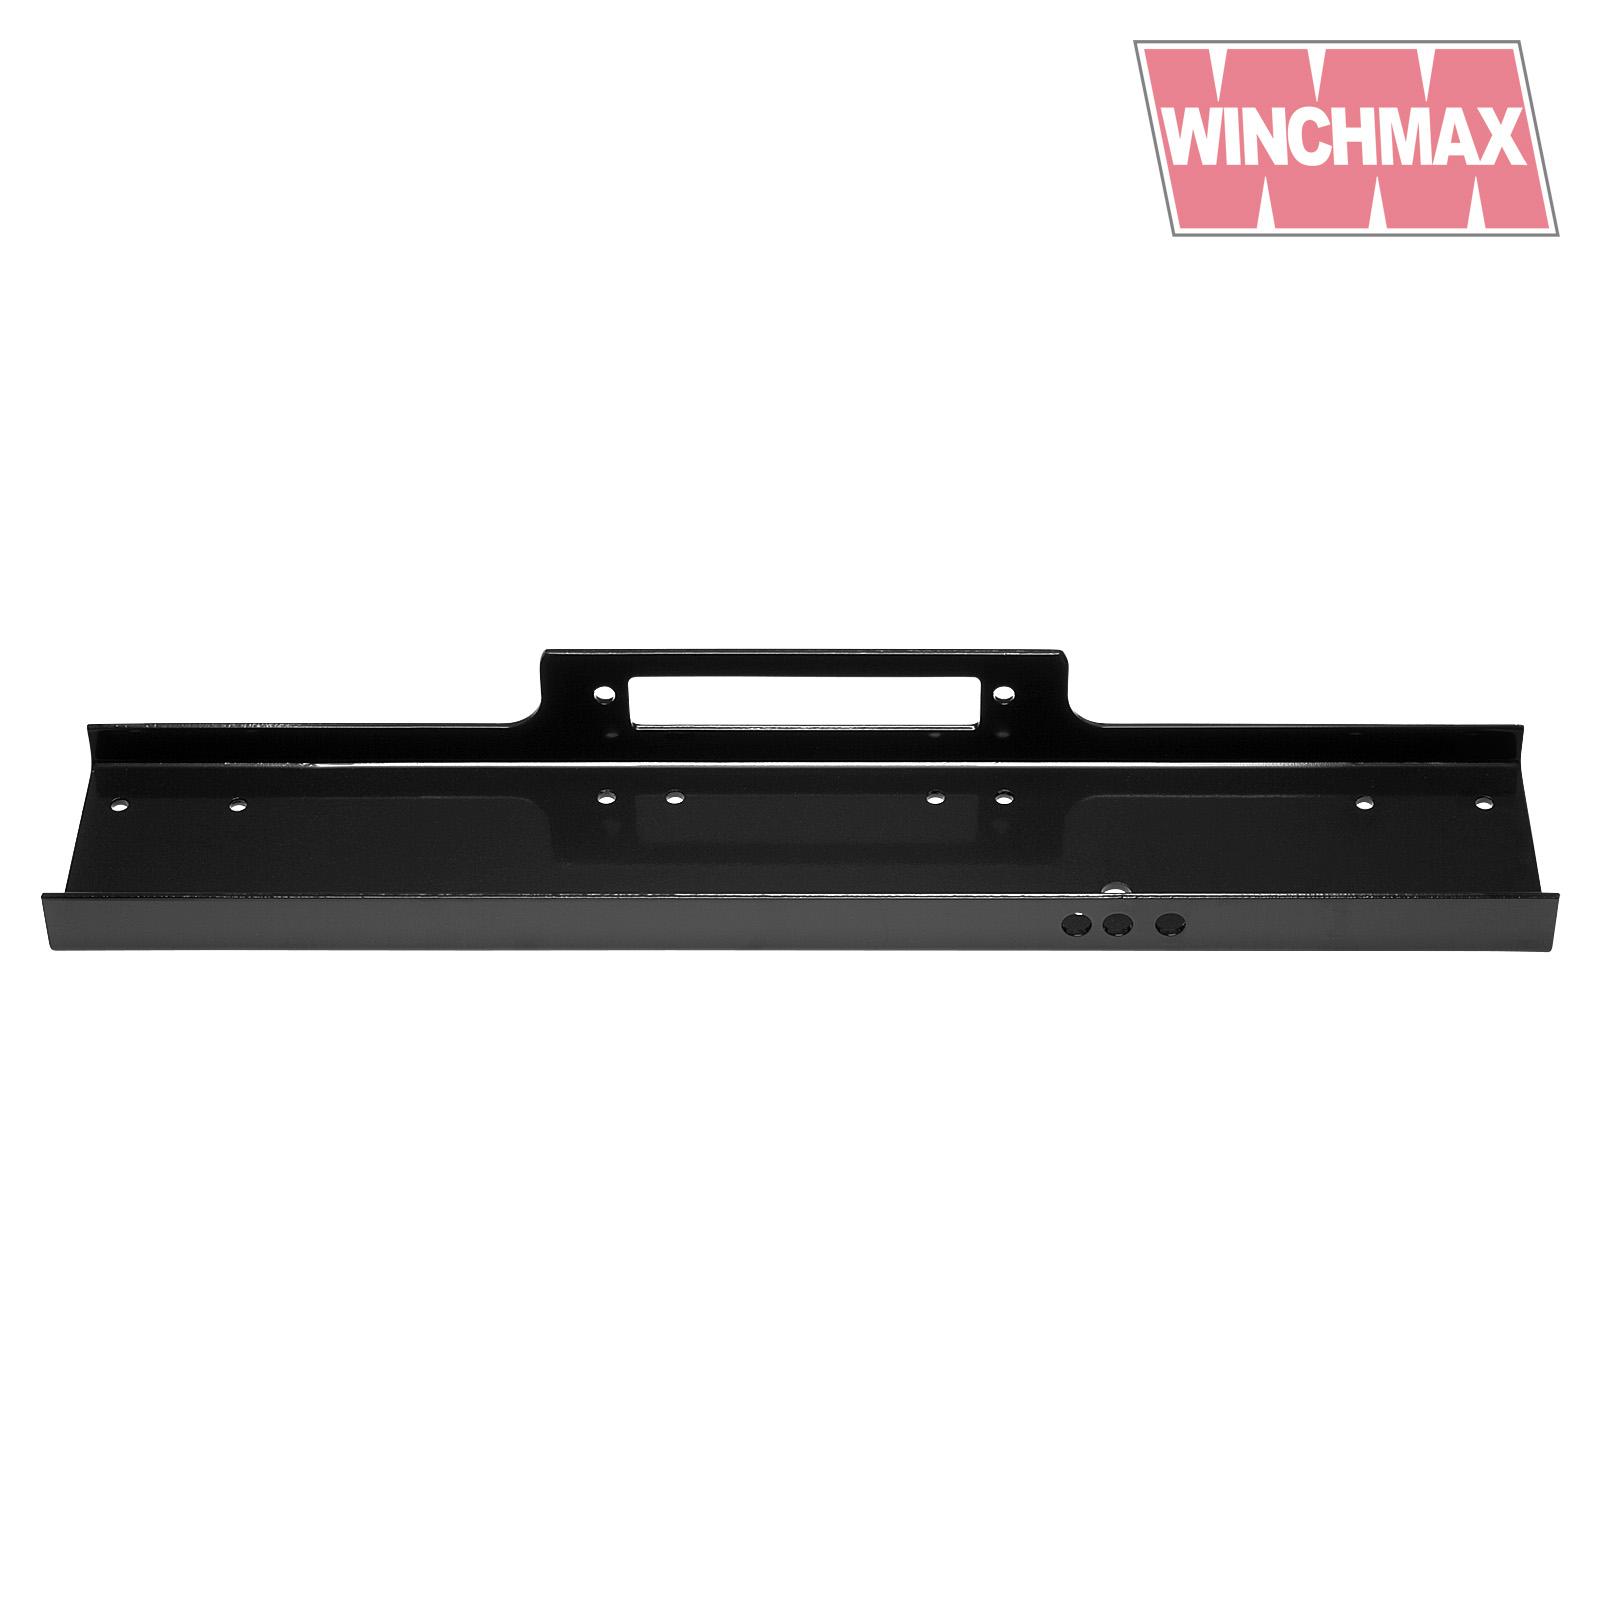 Wmmp2 winchmax 639